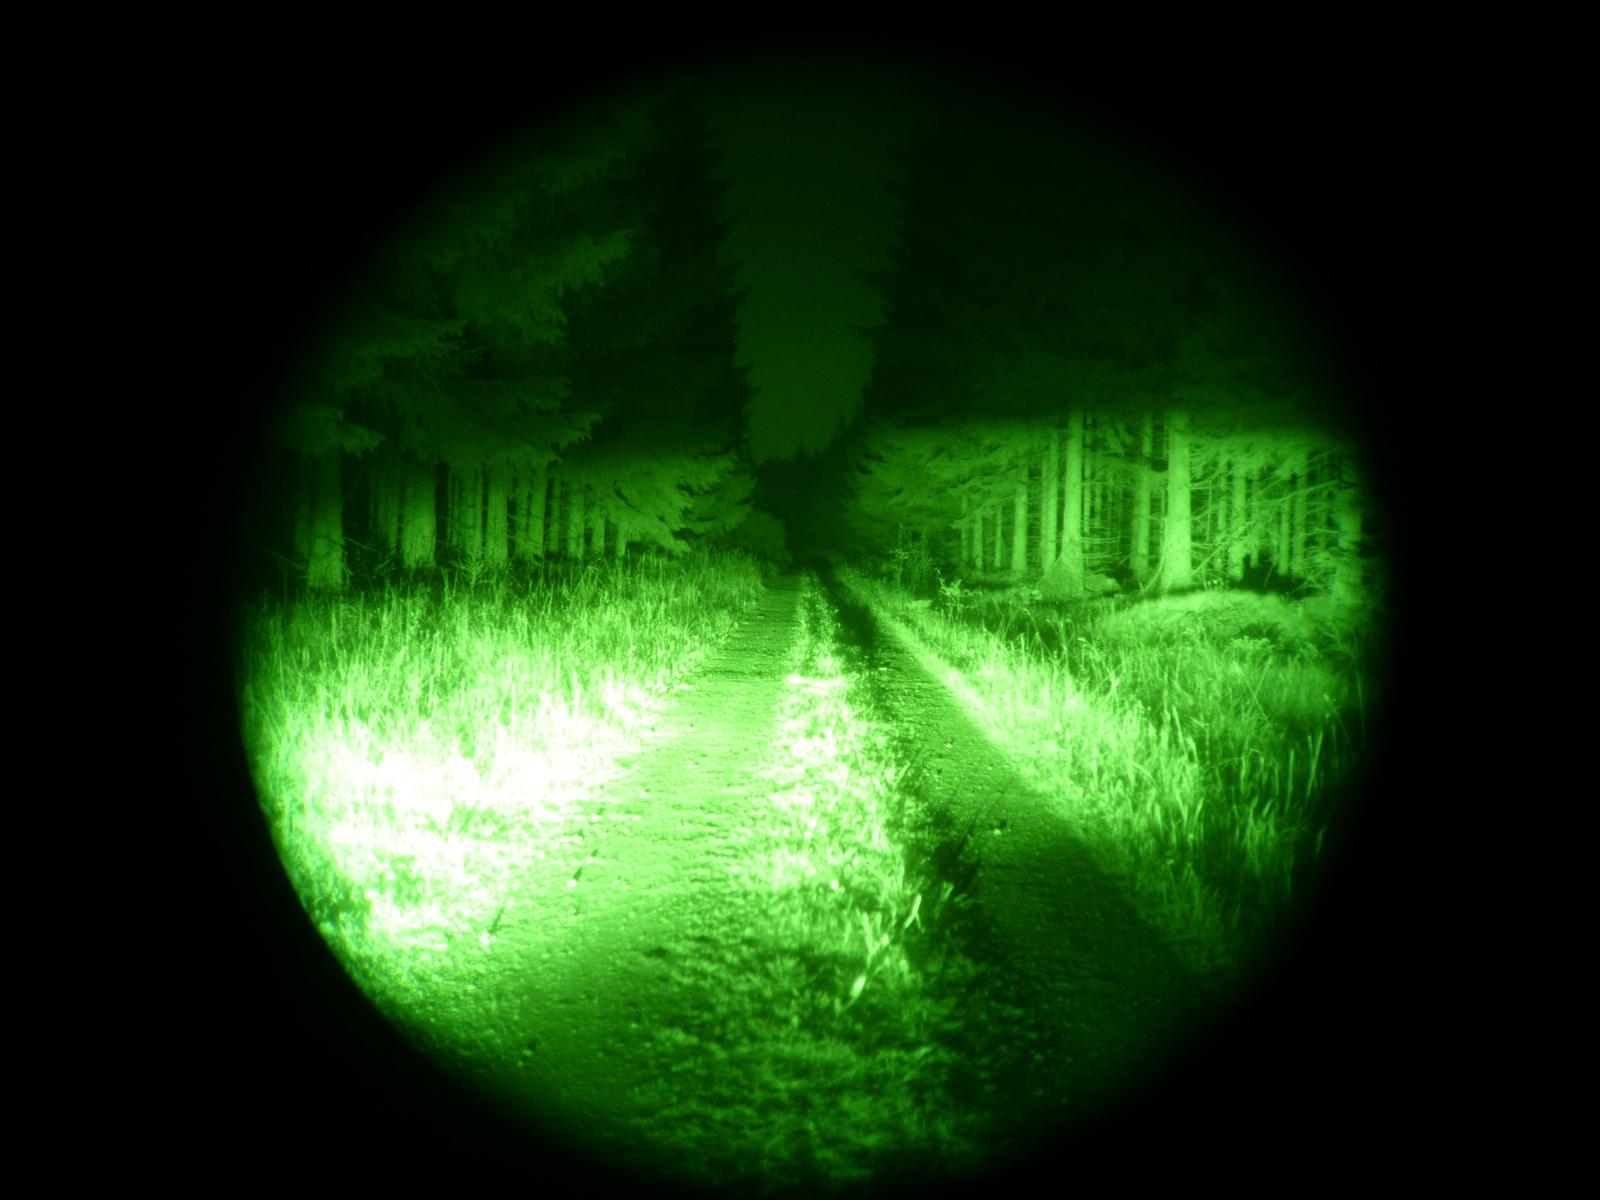 © Nolden Cars&Concepts - Mit 850 nm Infrarot-Beleuchtung im Wald.